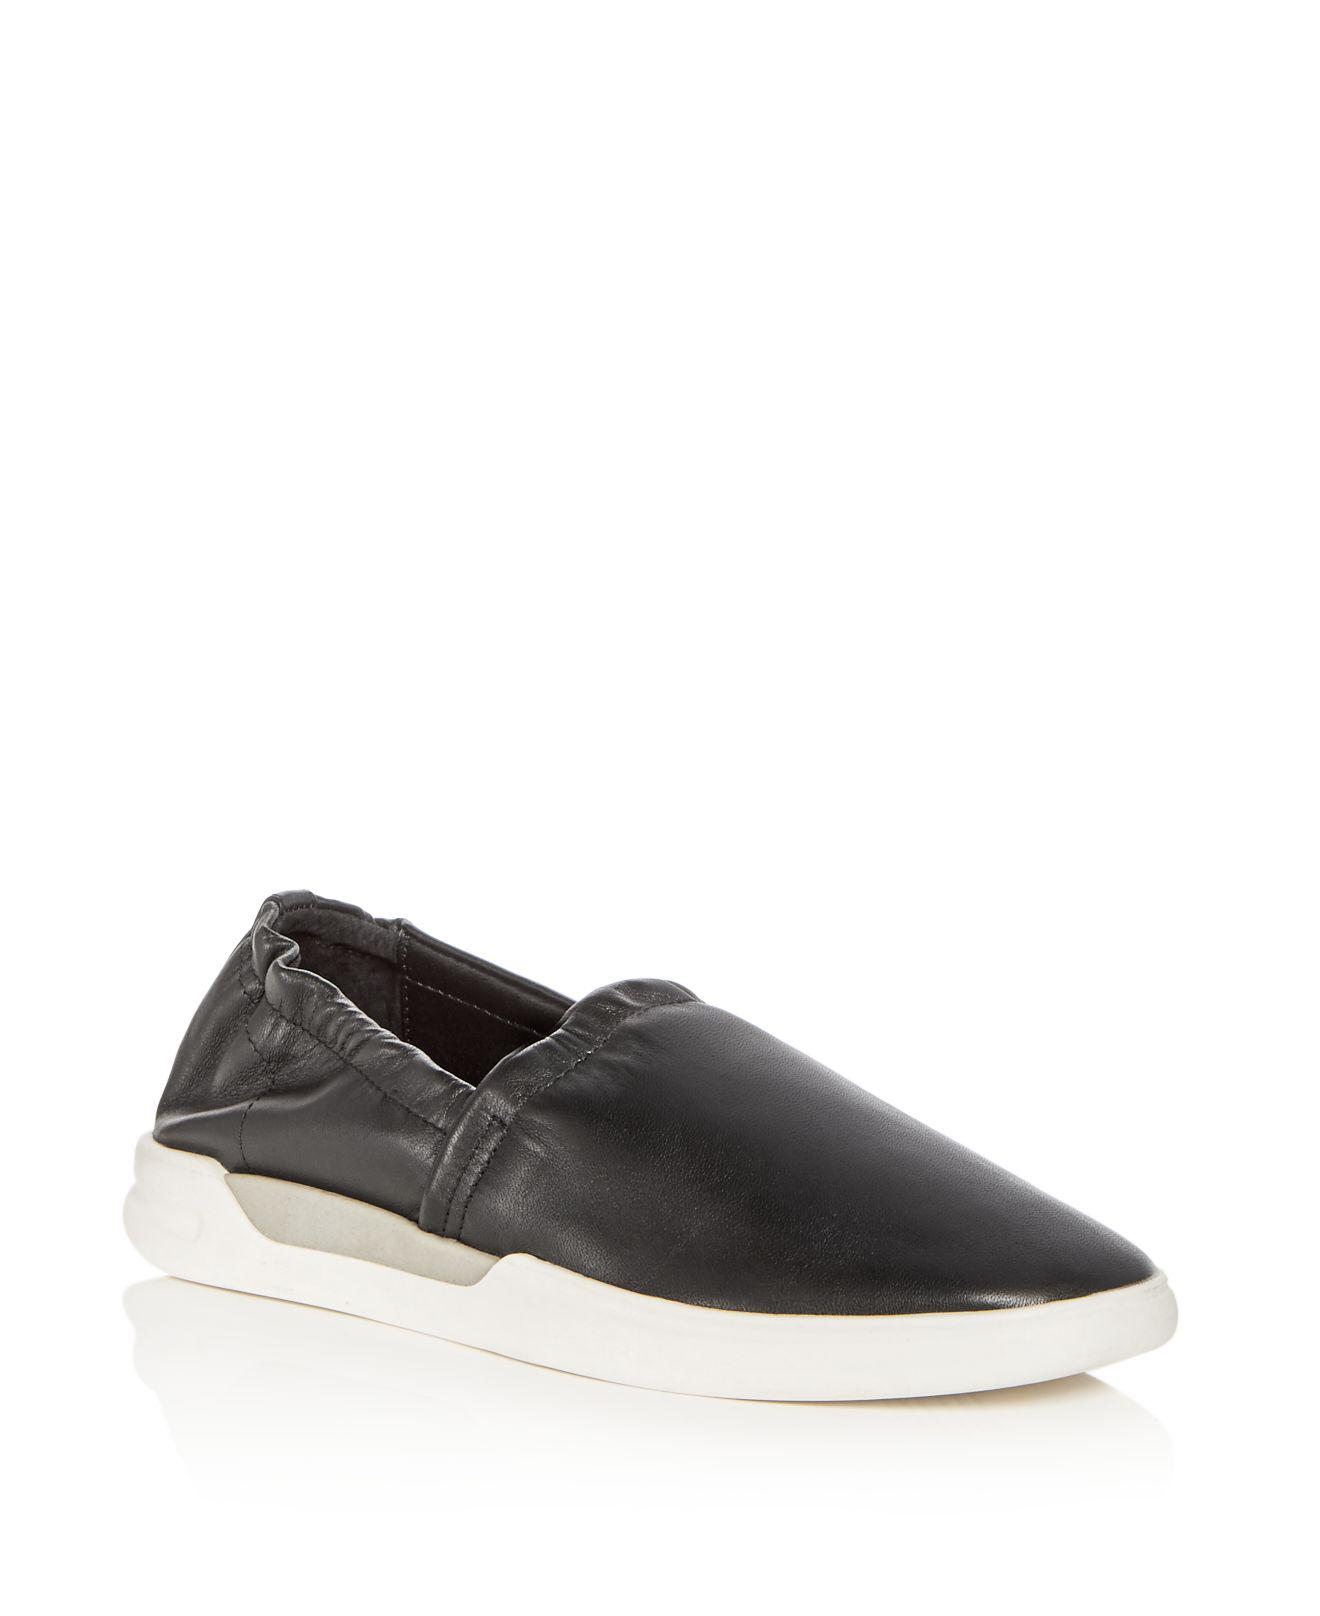 Donald Pliner Women's Gene Leather Slip-On Sneakers uX9miJtj